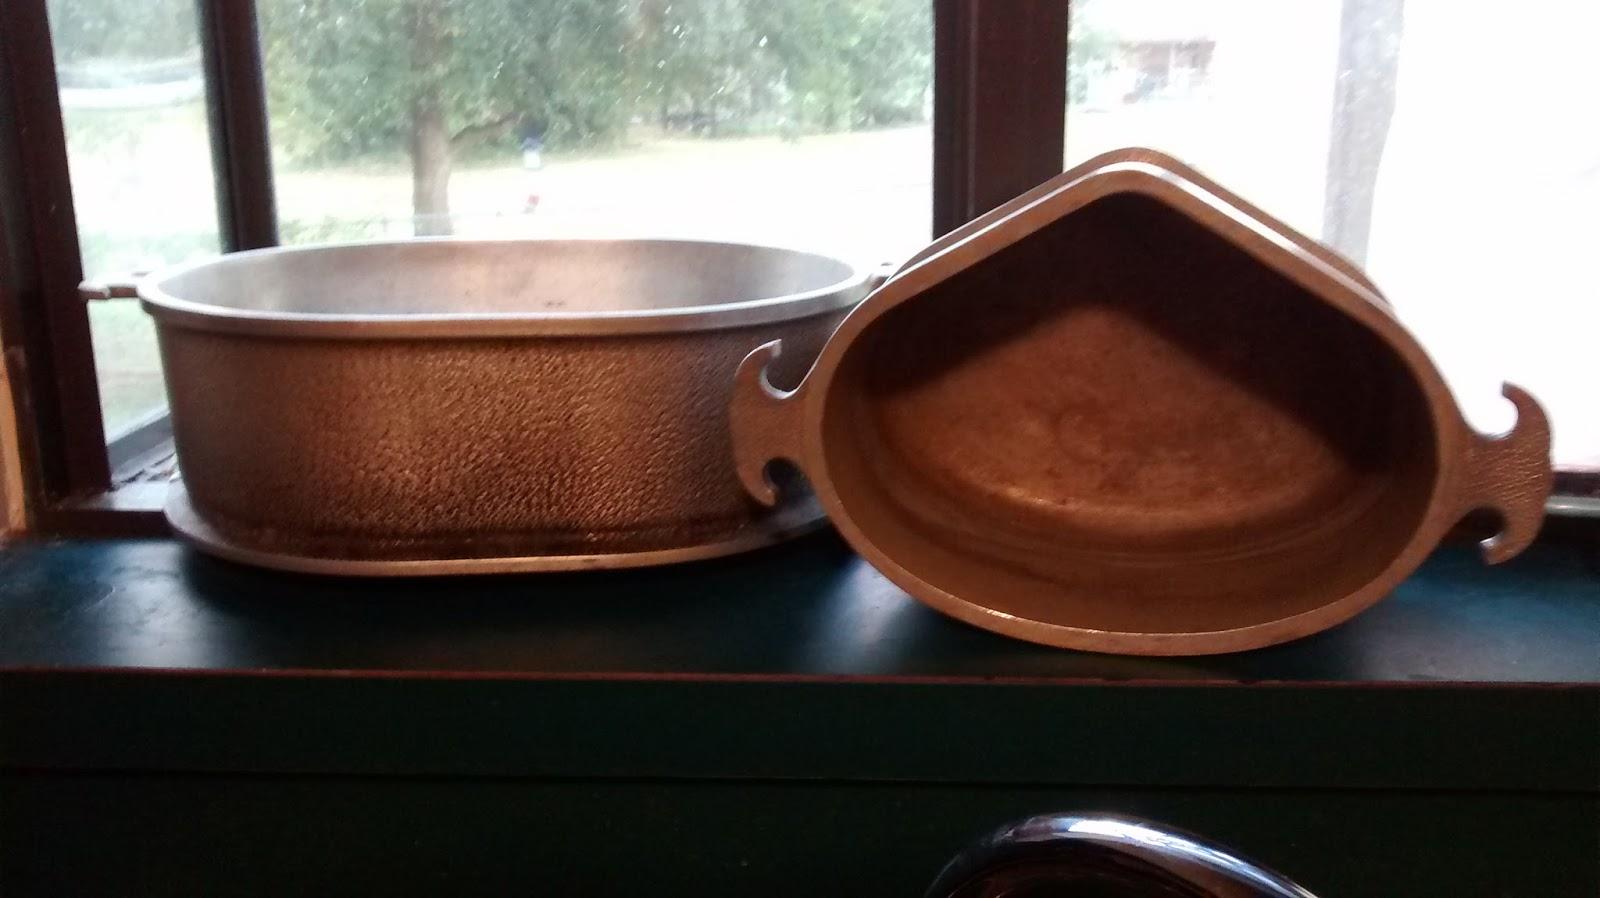 Top Kitchen Cookware Sets